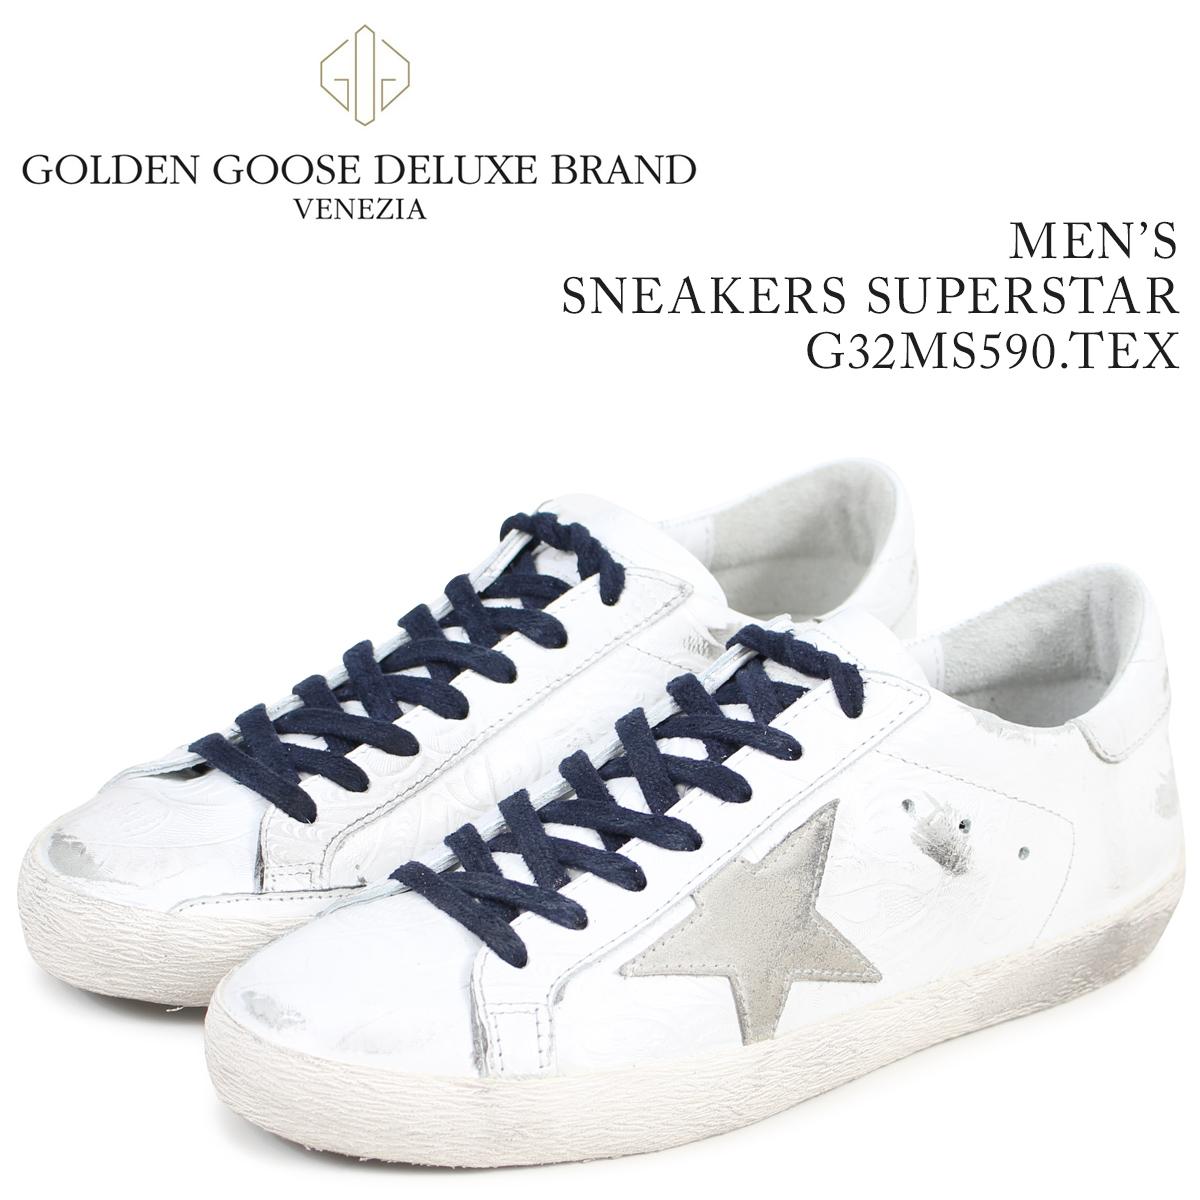 Golden Goose ゴールデングース スニーカー メンズ スーパースター SNEAKERS SUPERSTAR ホワイト G32MS590 TEX